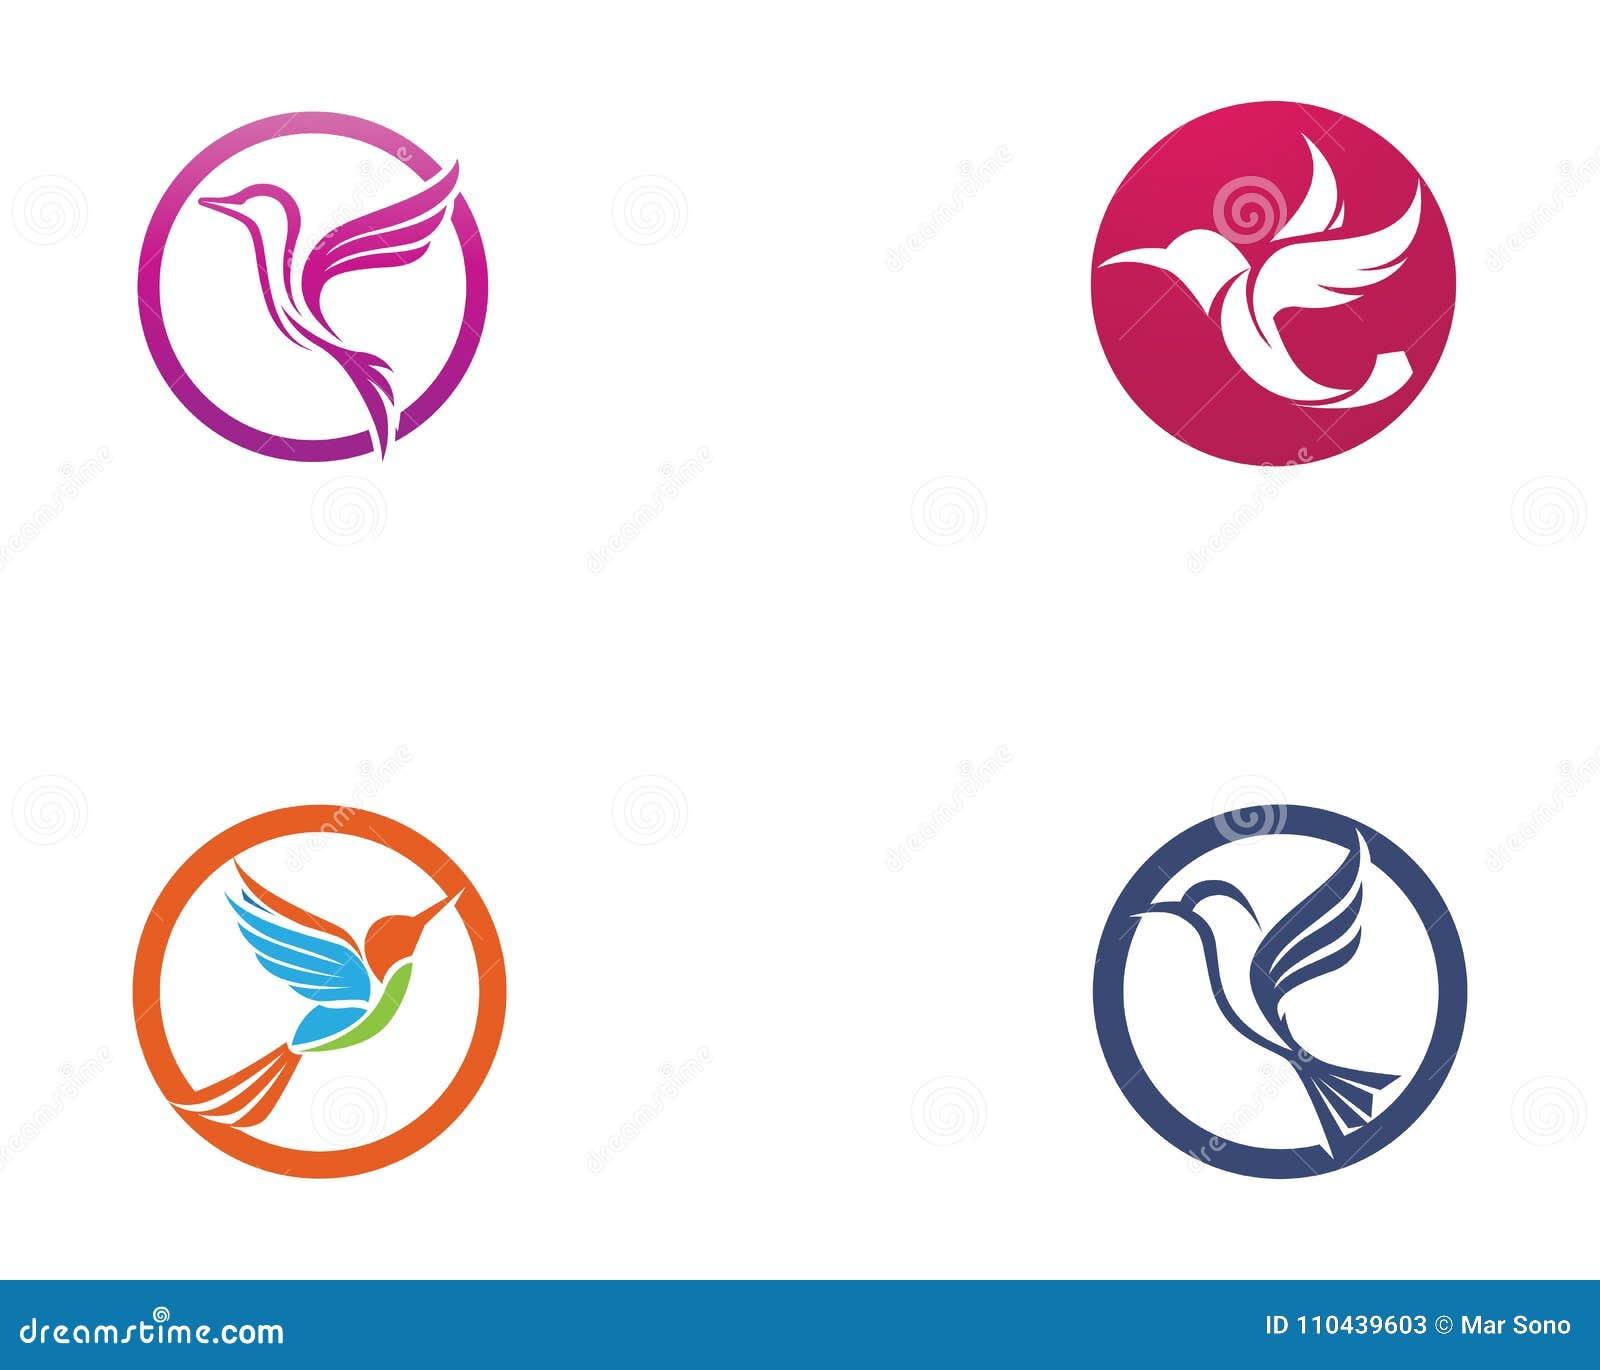 Hummingbird Icon Logo And Symbols Template Vector Stock Vector